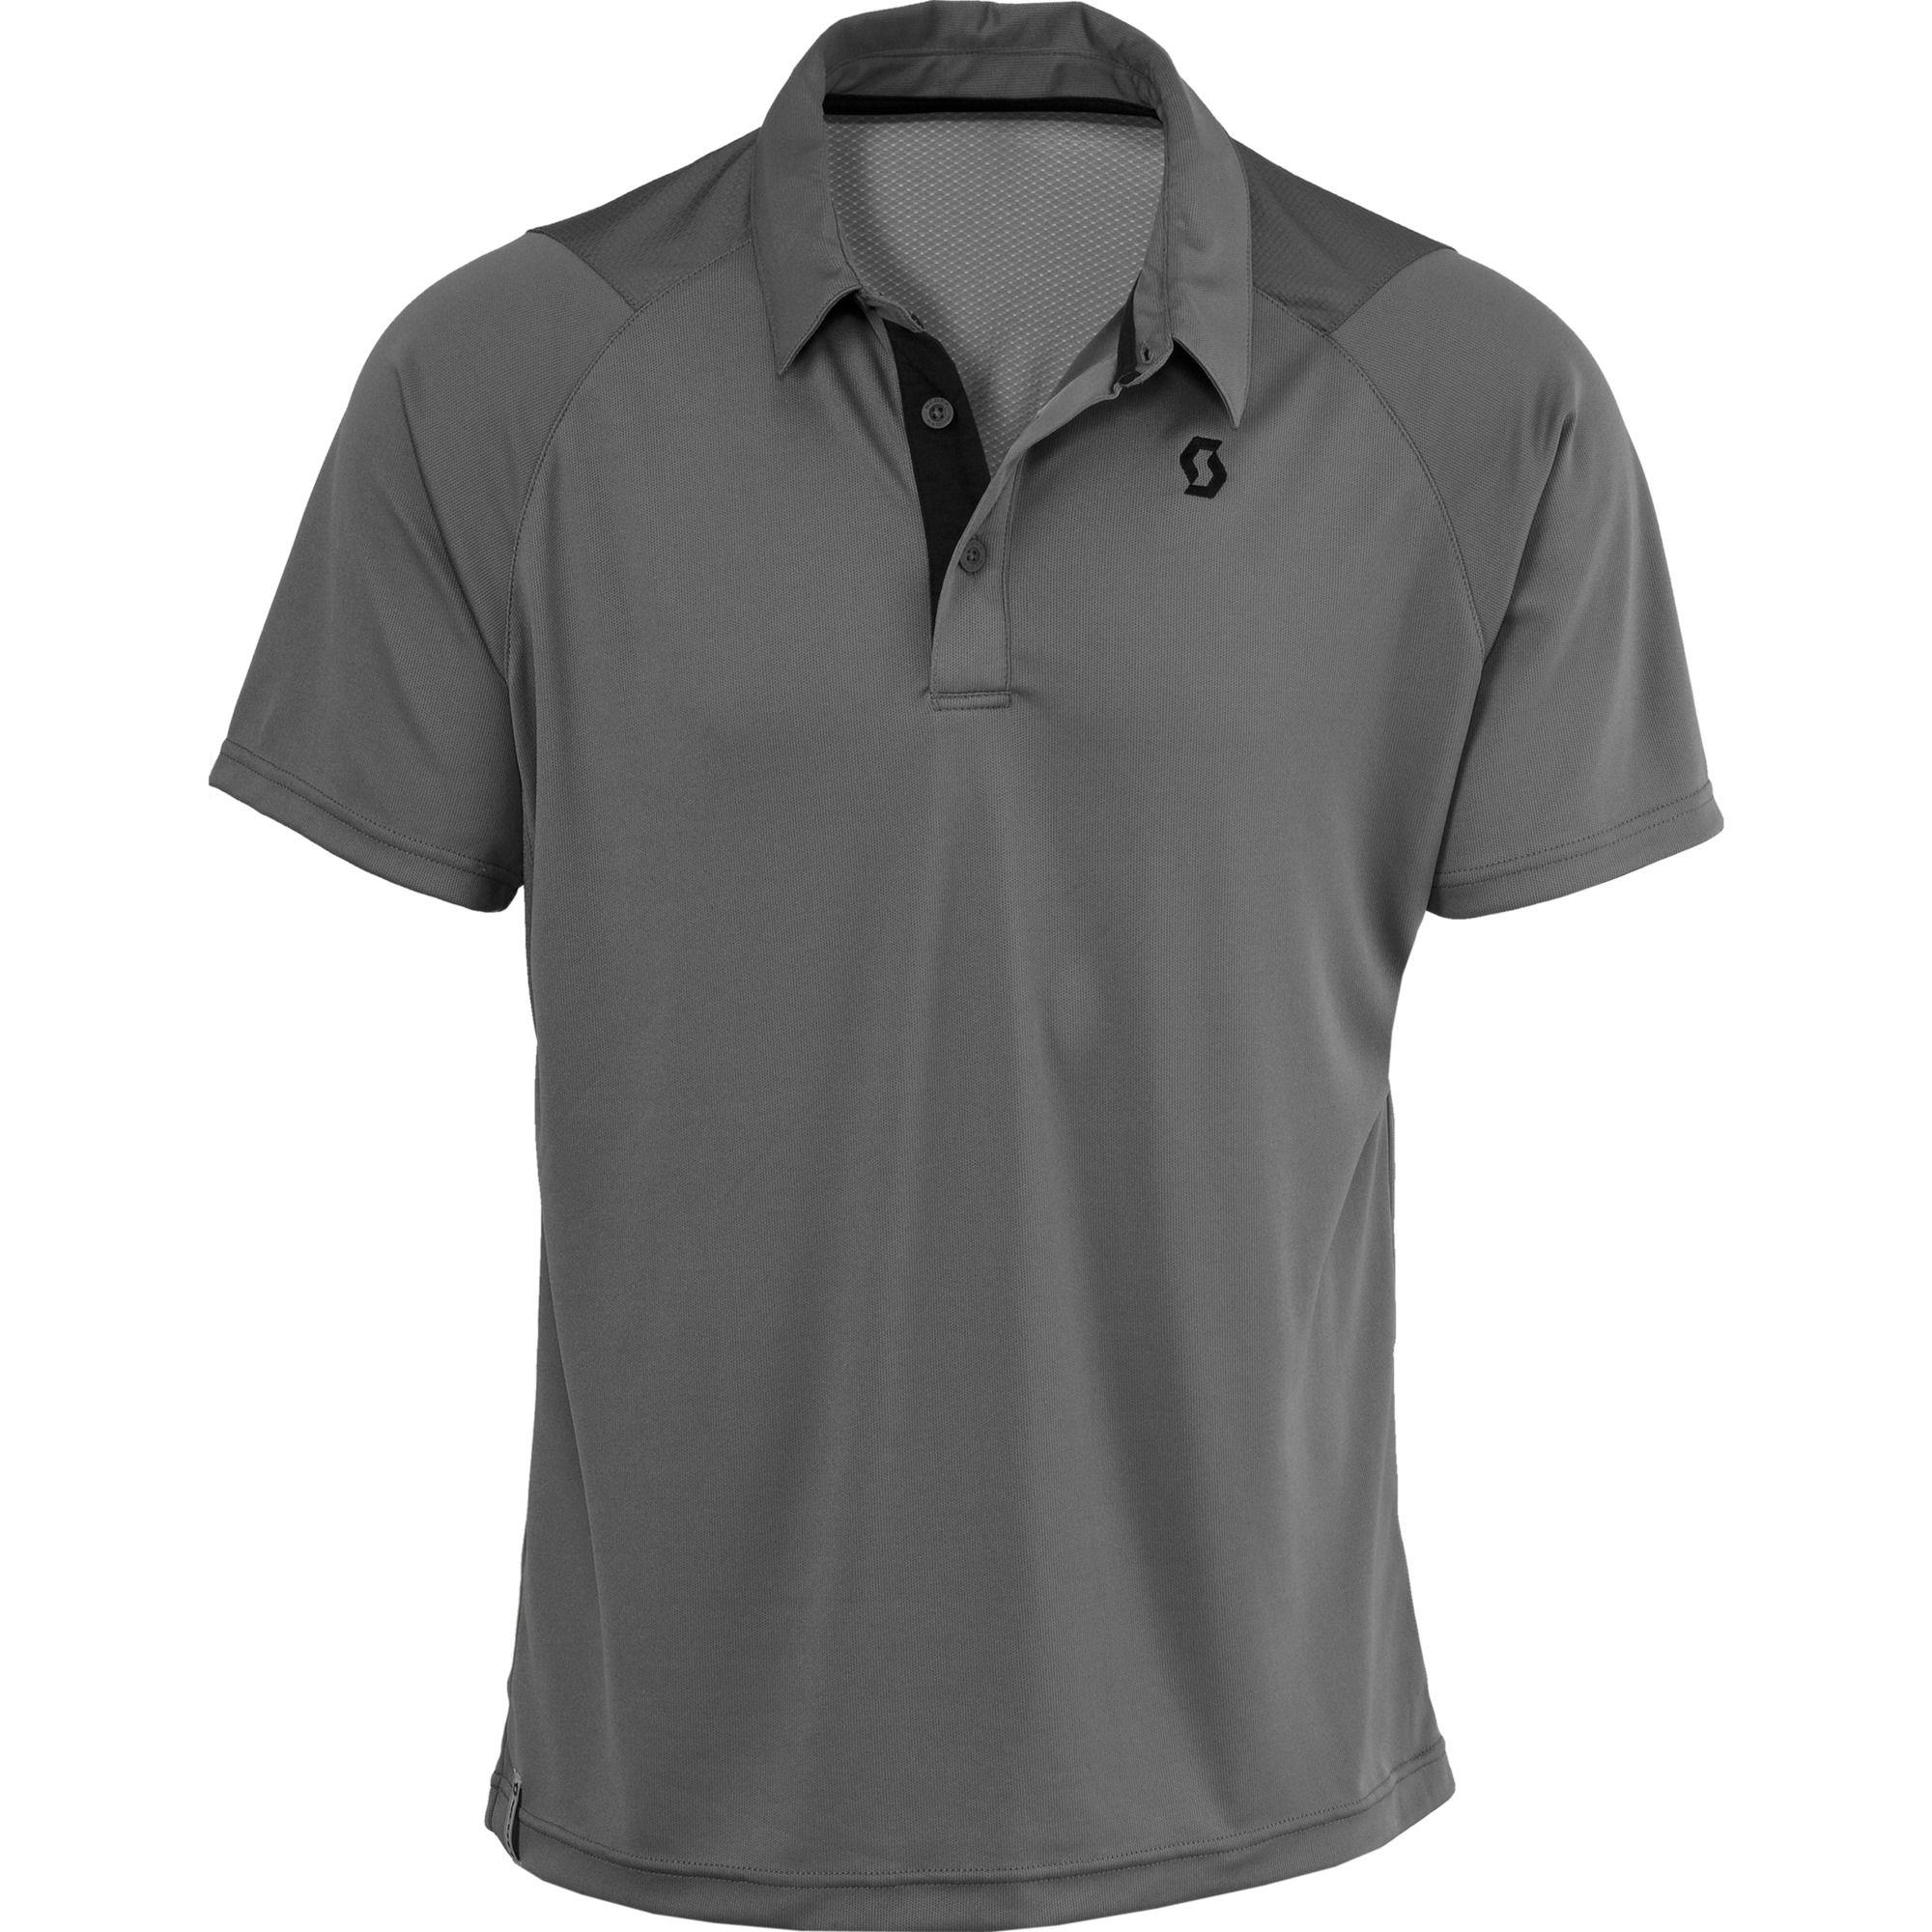 Custom Polo Shirts Online 3d Polo Shirt Designer Hockerty Custom Polo Shirts Black Polo Shirt Long Sleeve Polo Shirt